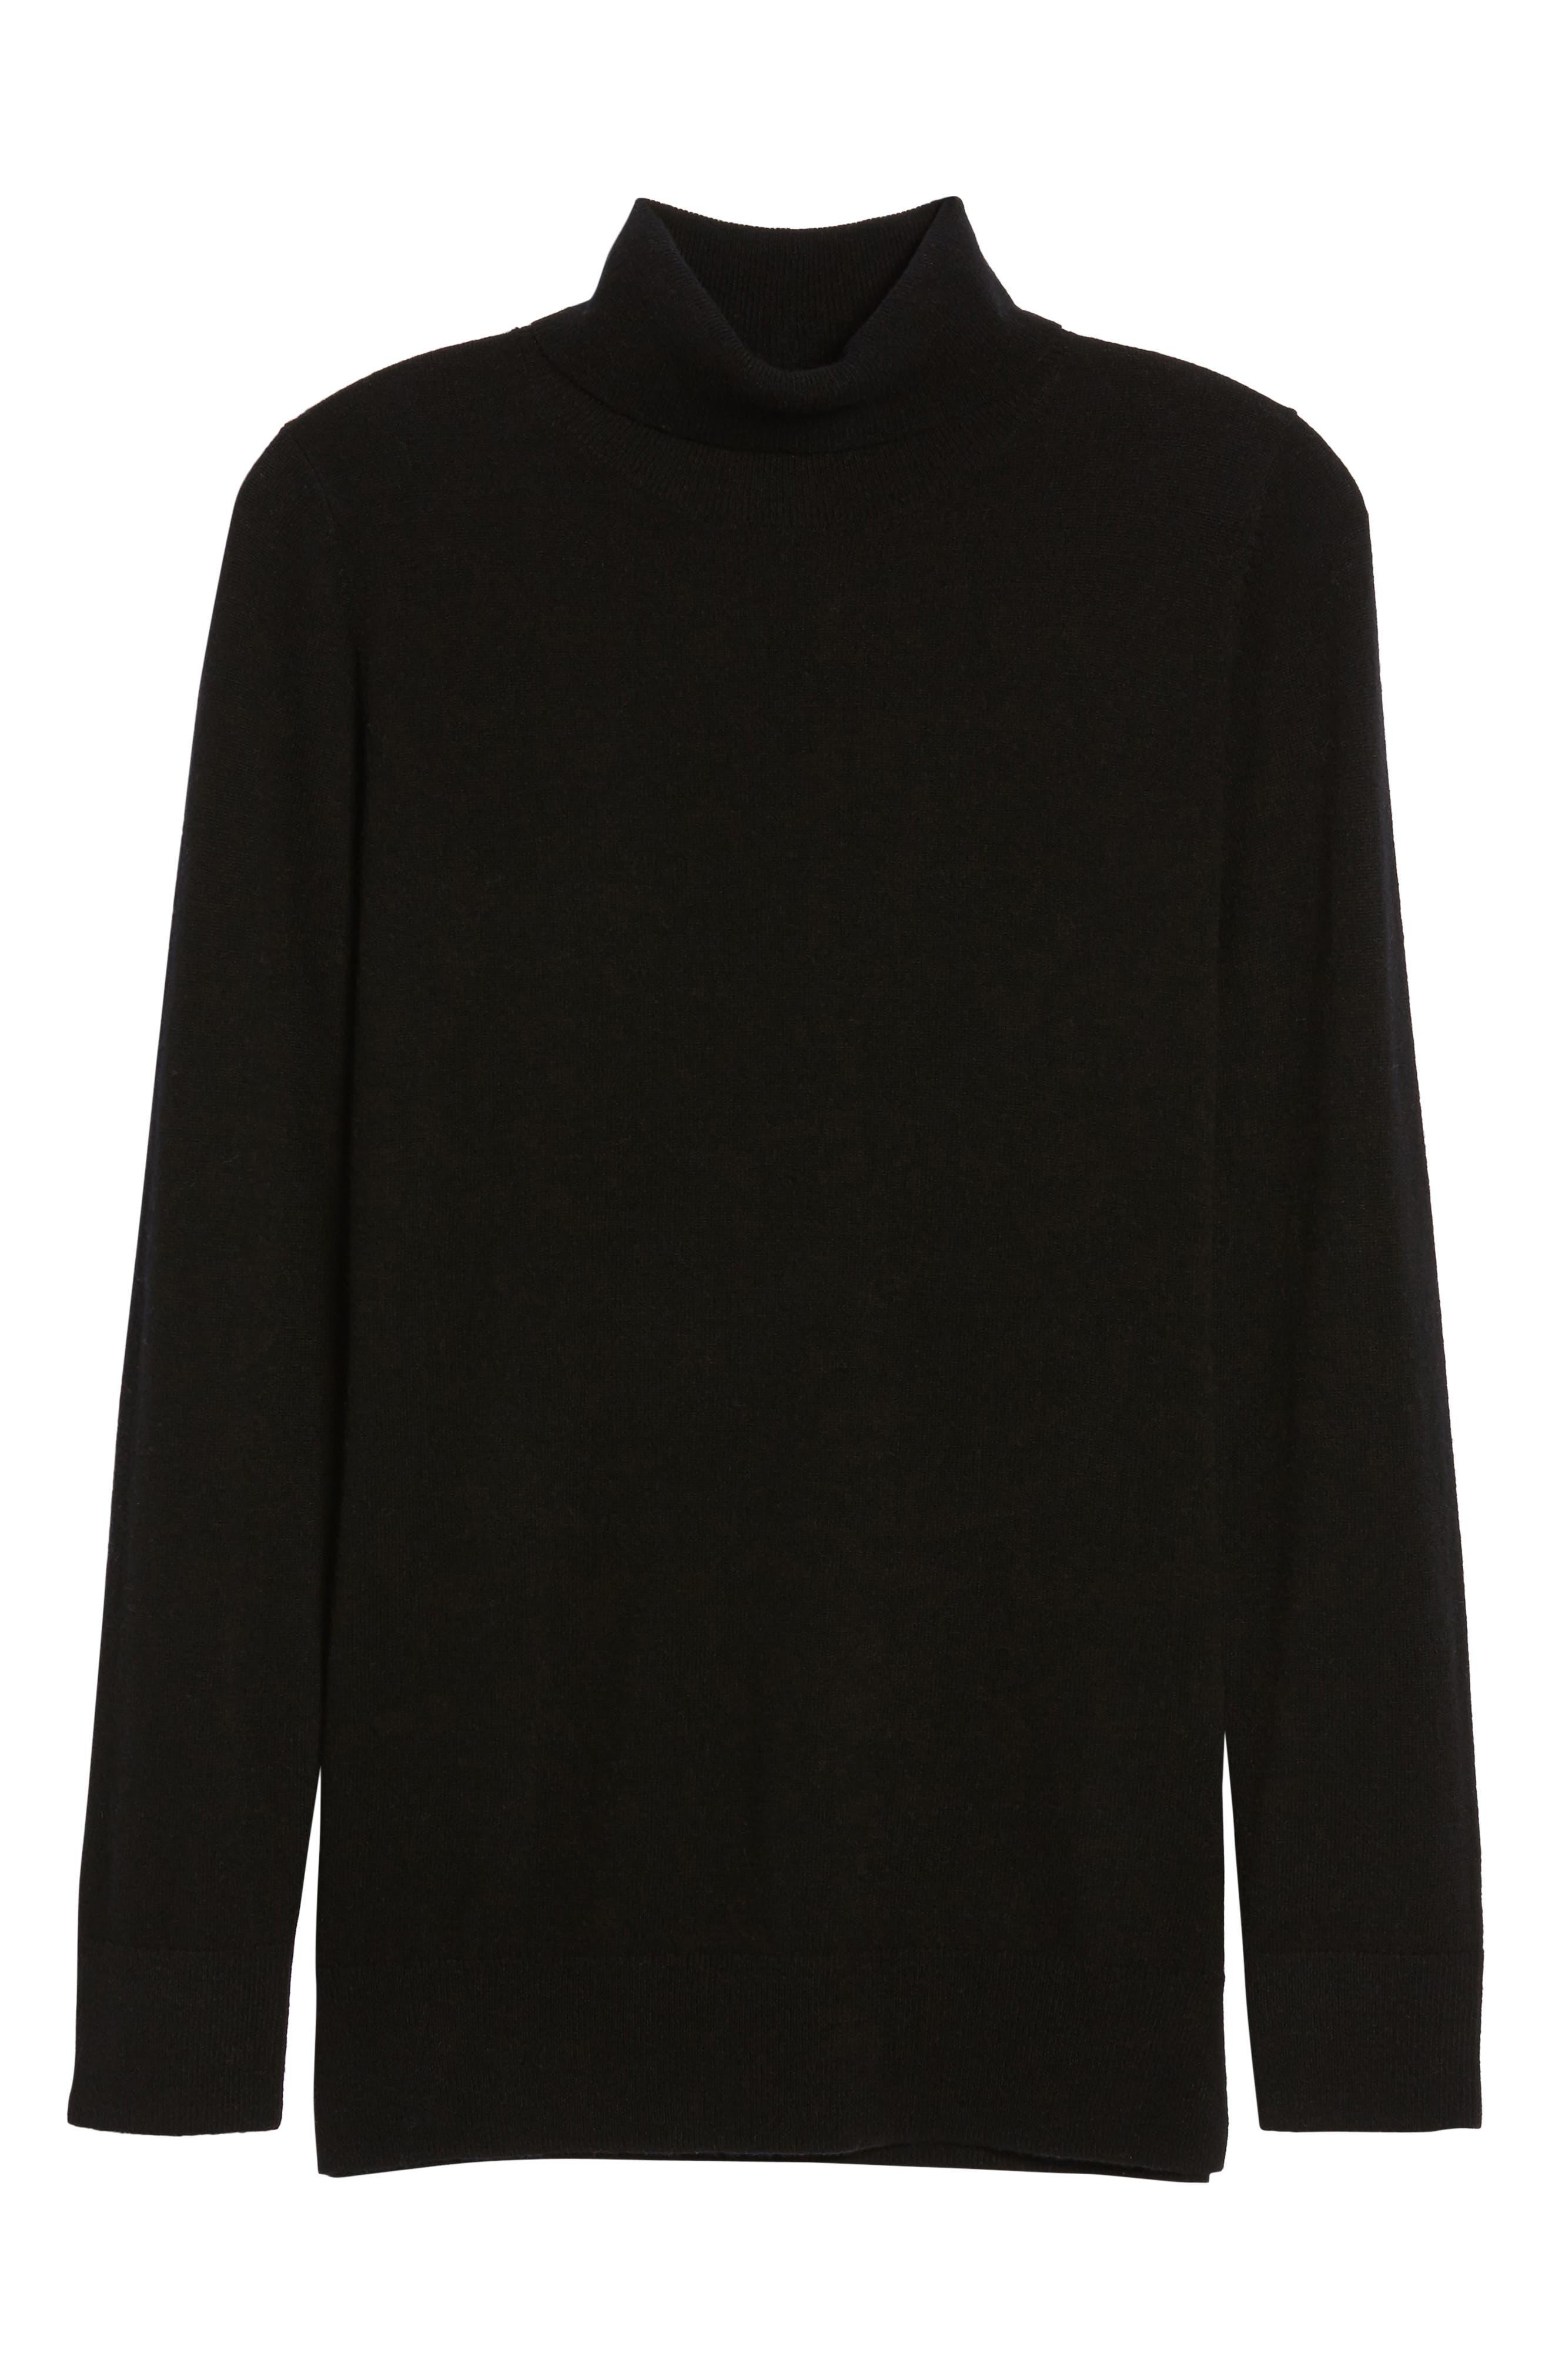 Turtleneck Cashmere Sweater,                             Alternate thumbnail 6, color,                             BLACK